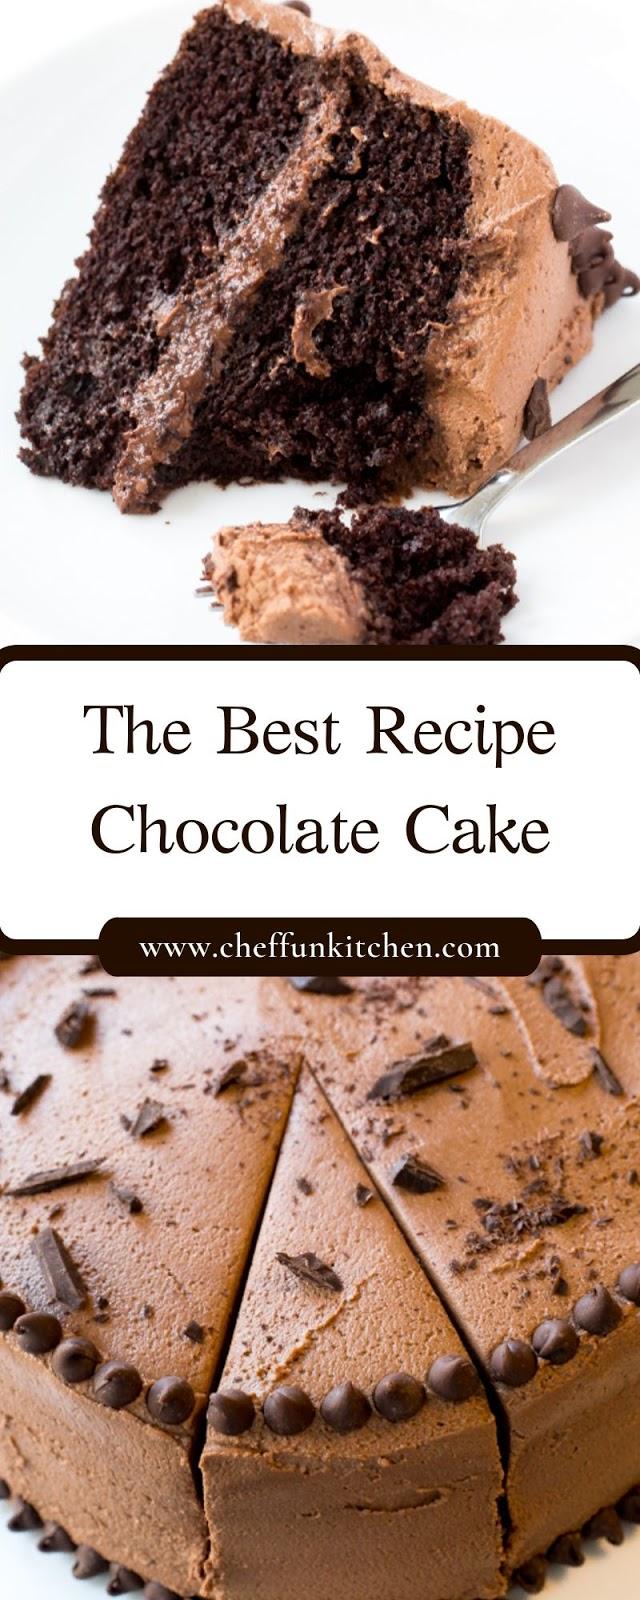 The Best Recipe Chocolate Cake